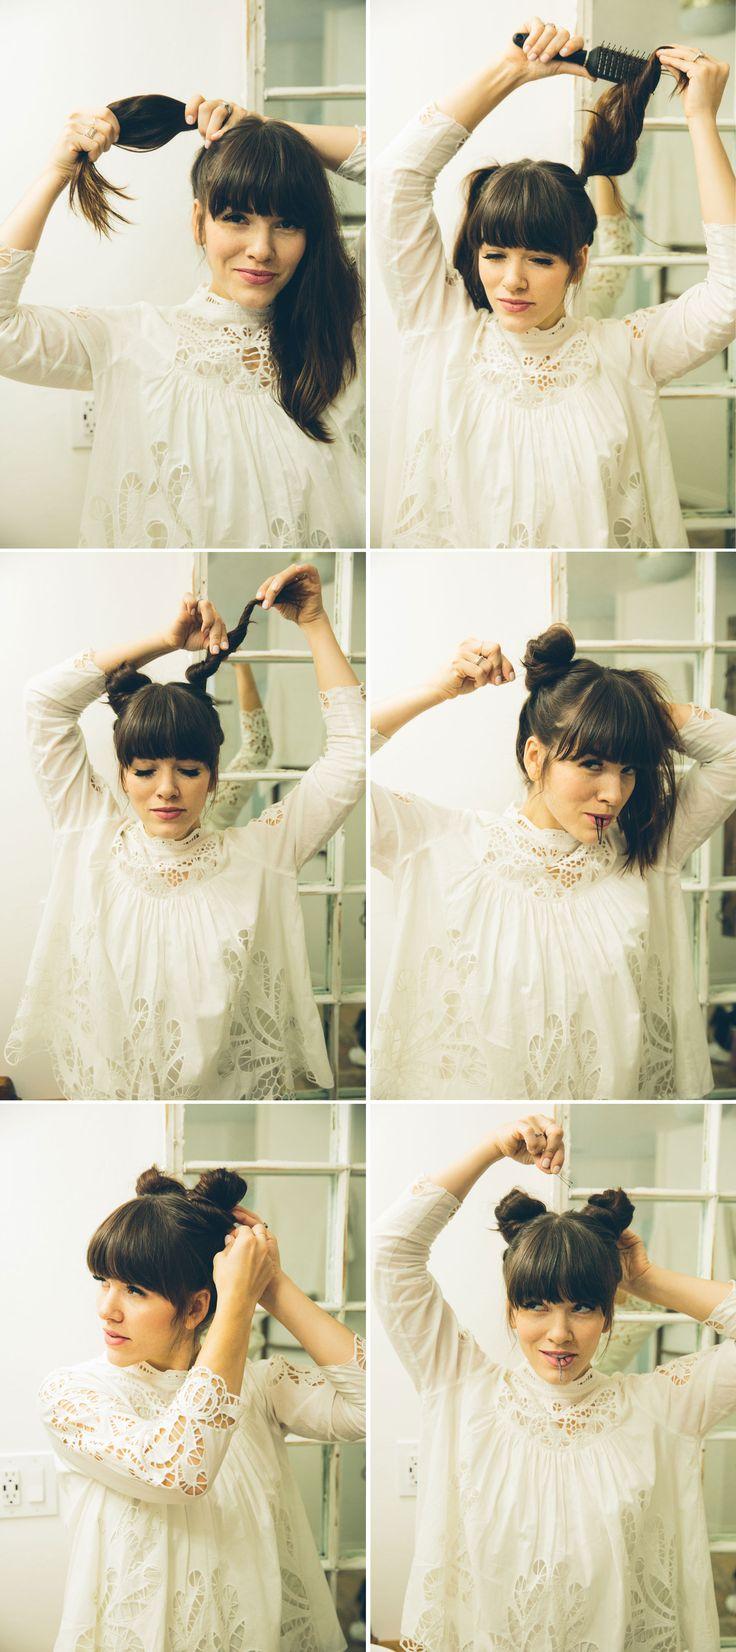 Wondrous The 25 Best Double Buns Ideas On Pinterest Hair Buns Twist Short Hairstyles Gunalazisus